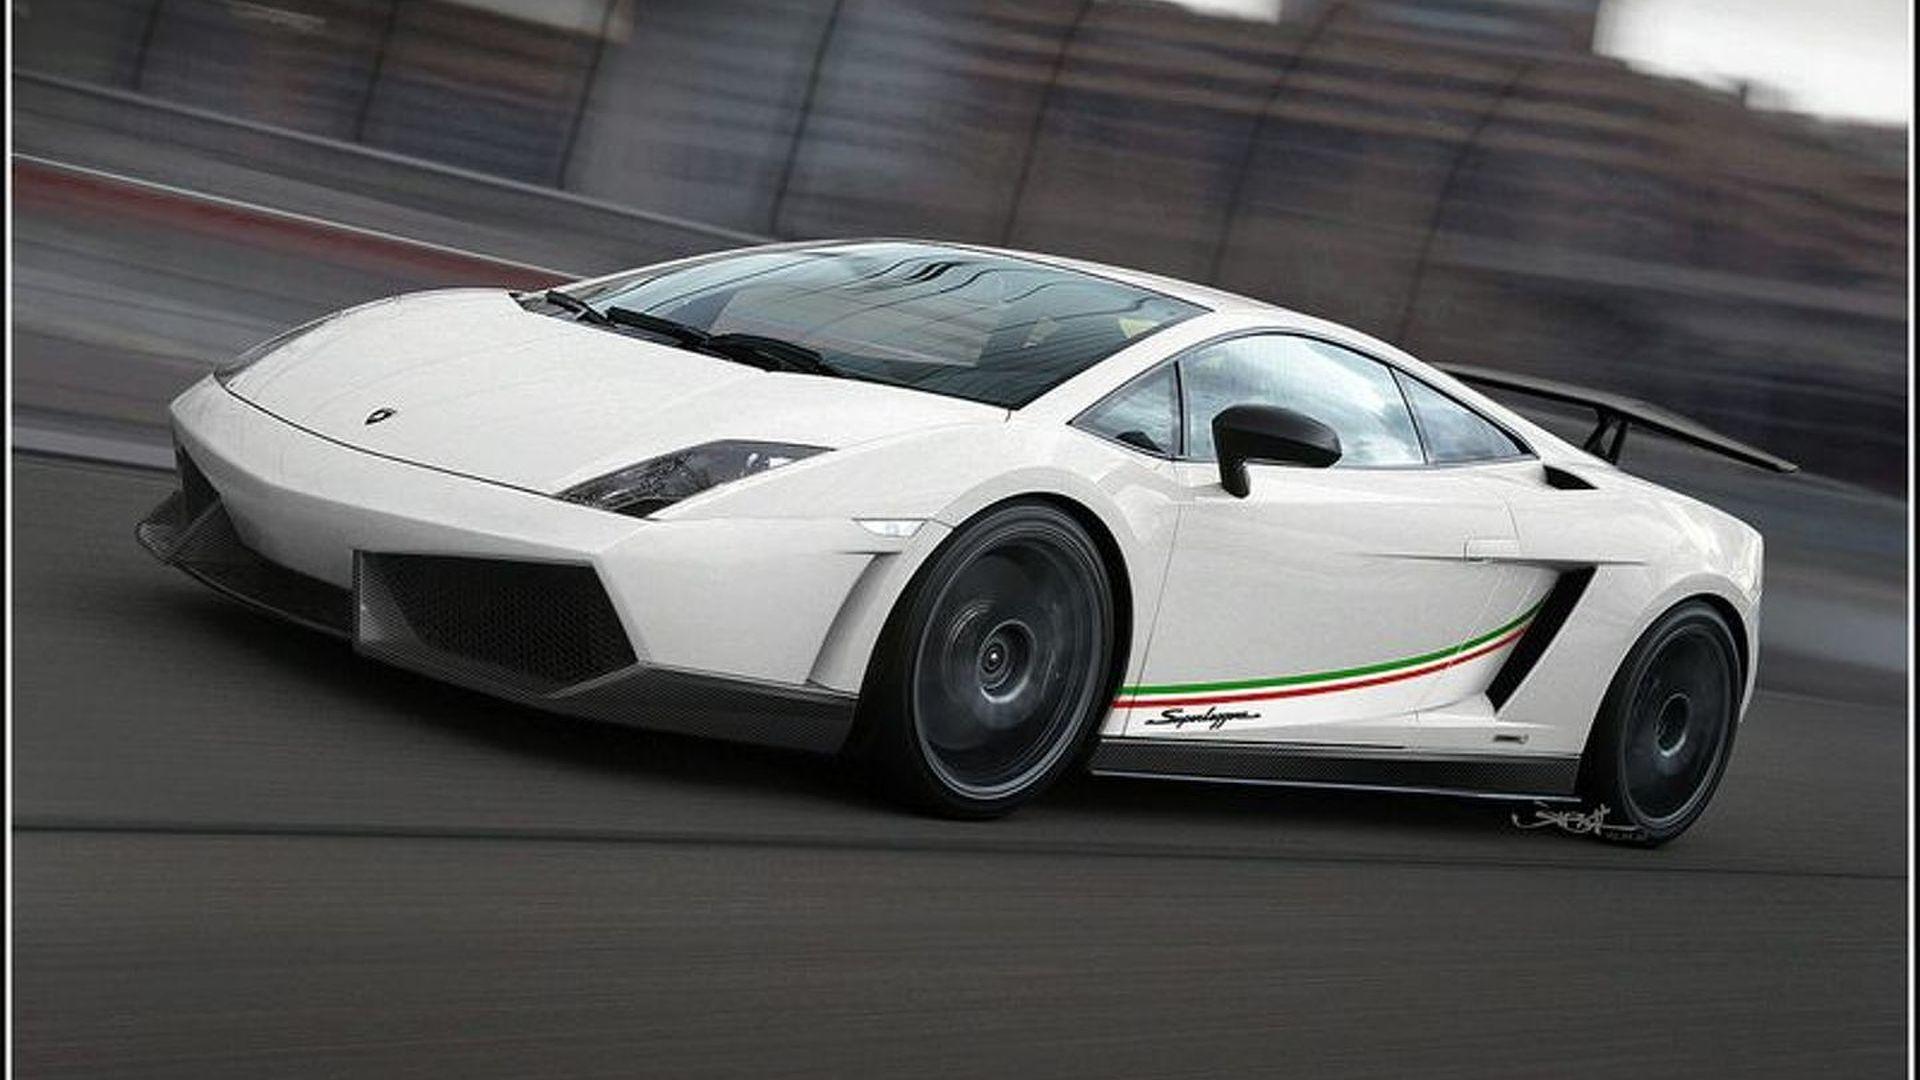 Lamborghini Gallardo Lp570 4 Superleggera Further Details And